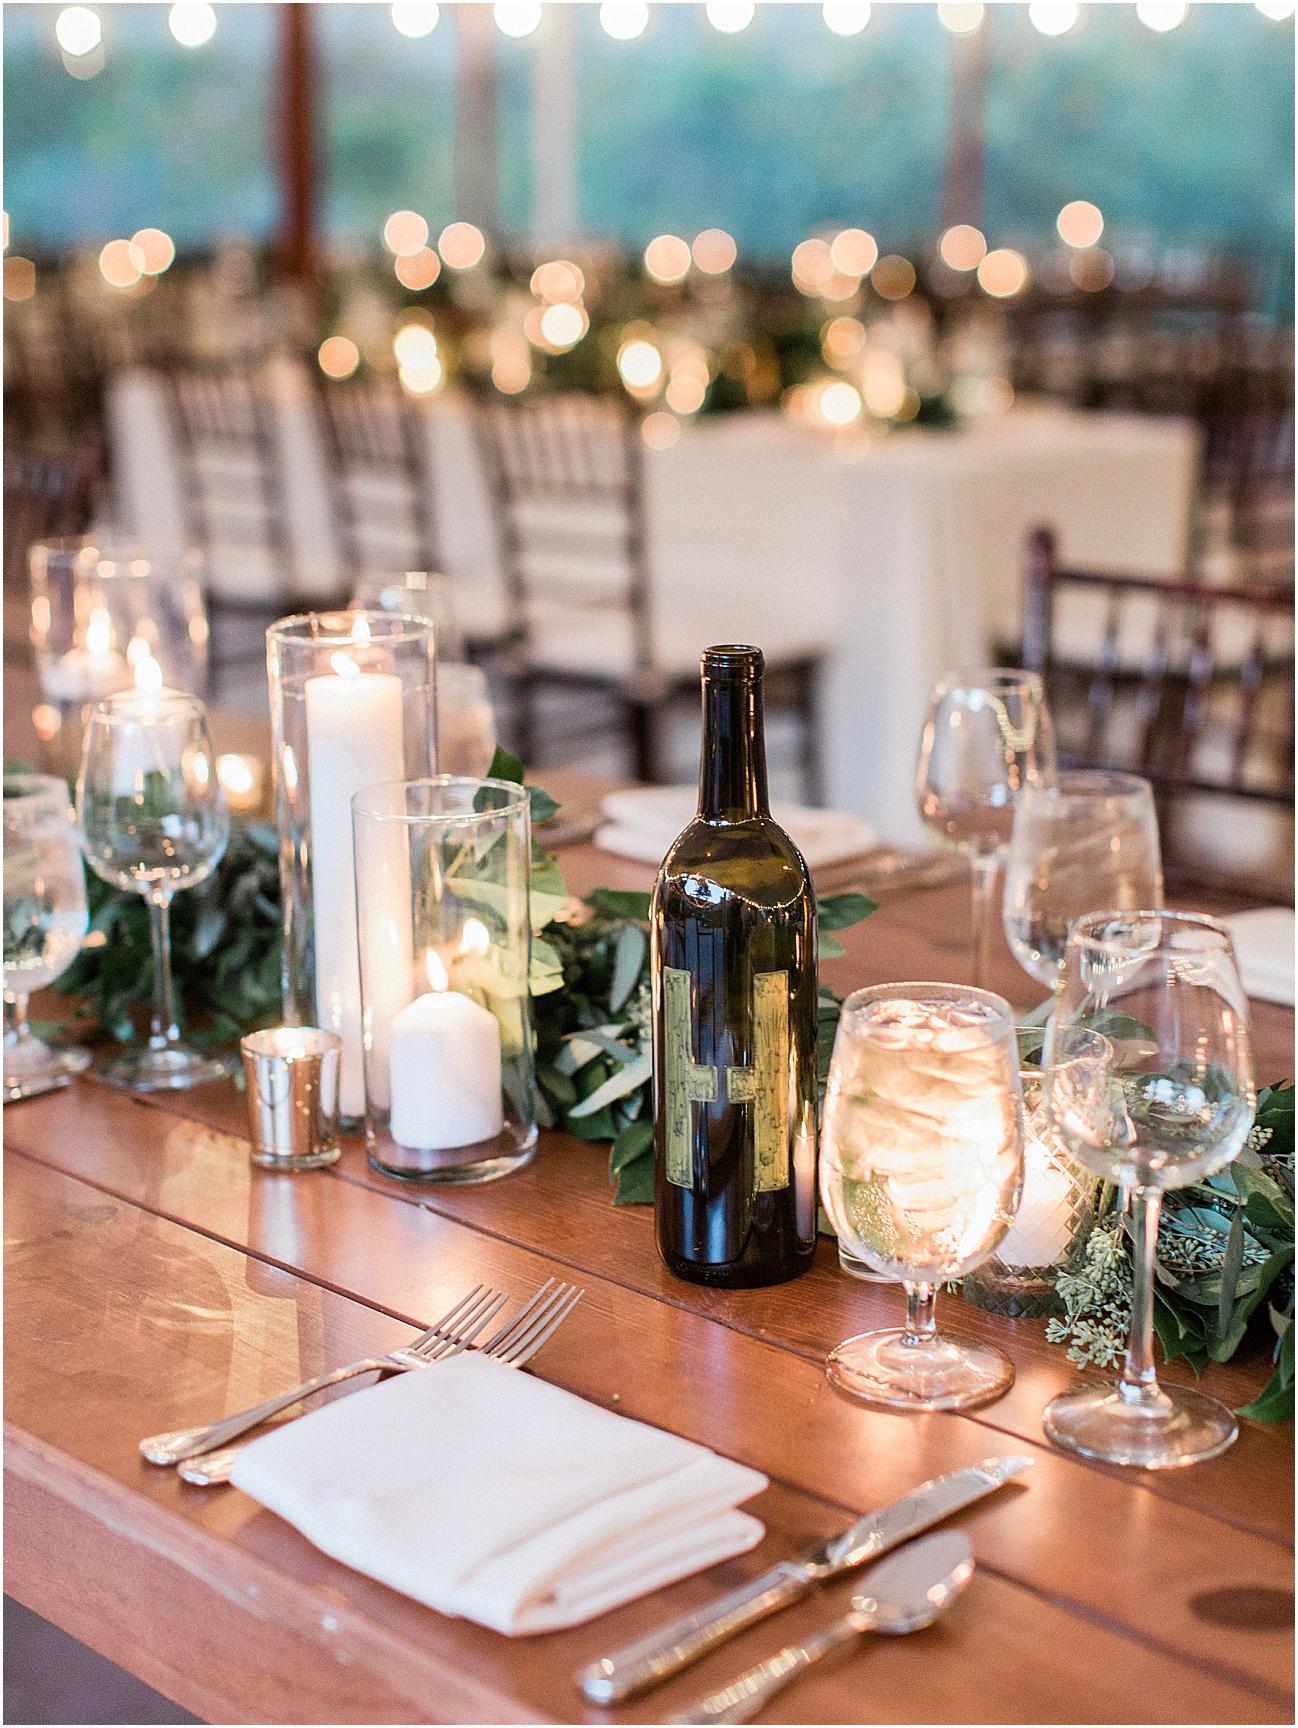 jenna_mike_willowdale_estate_topsfield_neutral_whites_greens_fall_cape_cod_boston_wedding_photographer_meredith_jane_photography_photo_1462.jpg